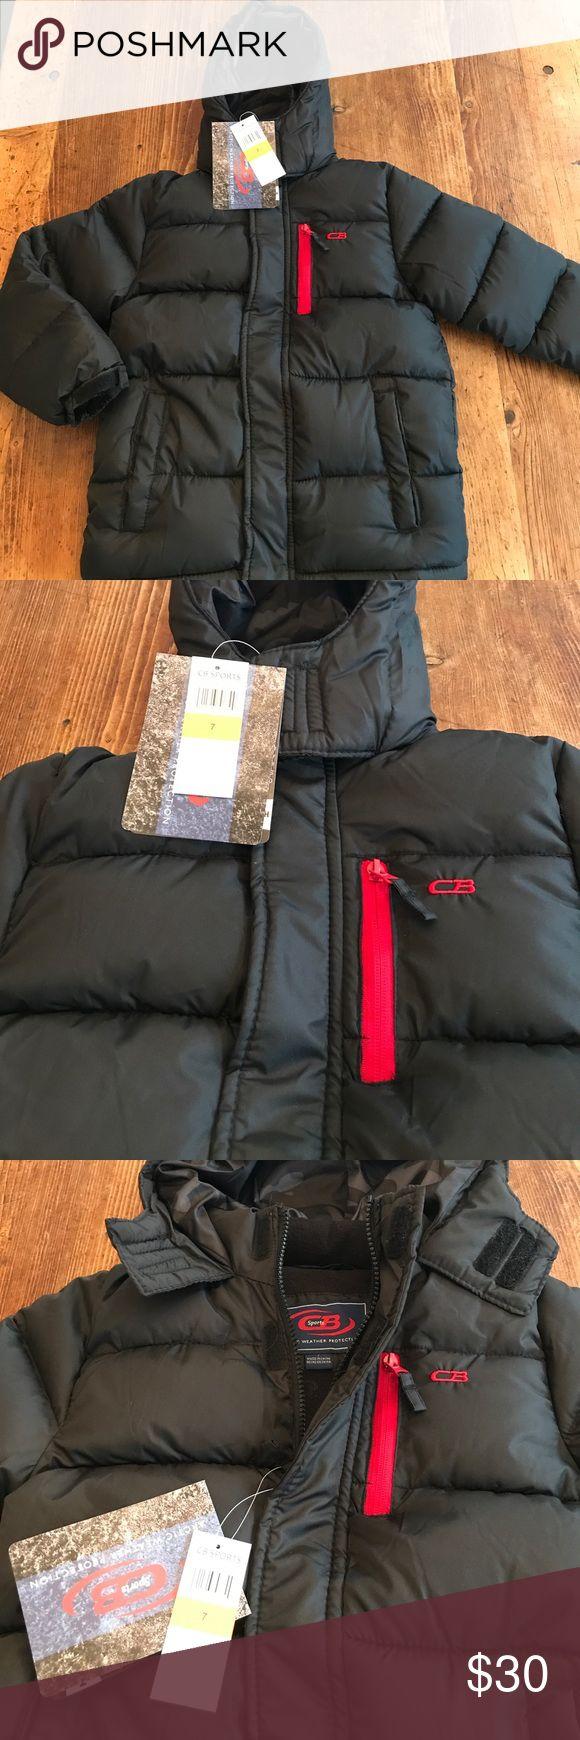 Boys winter coat nwt Really warm- lined with fleece cb sport Jackets & Coats Puffers